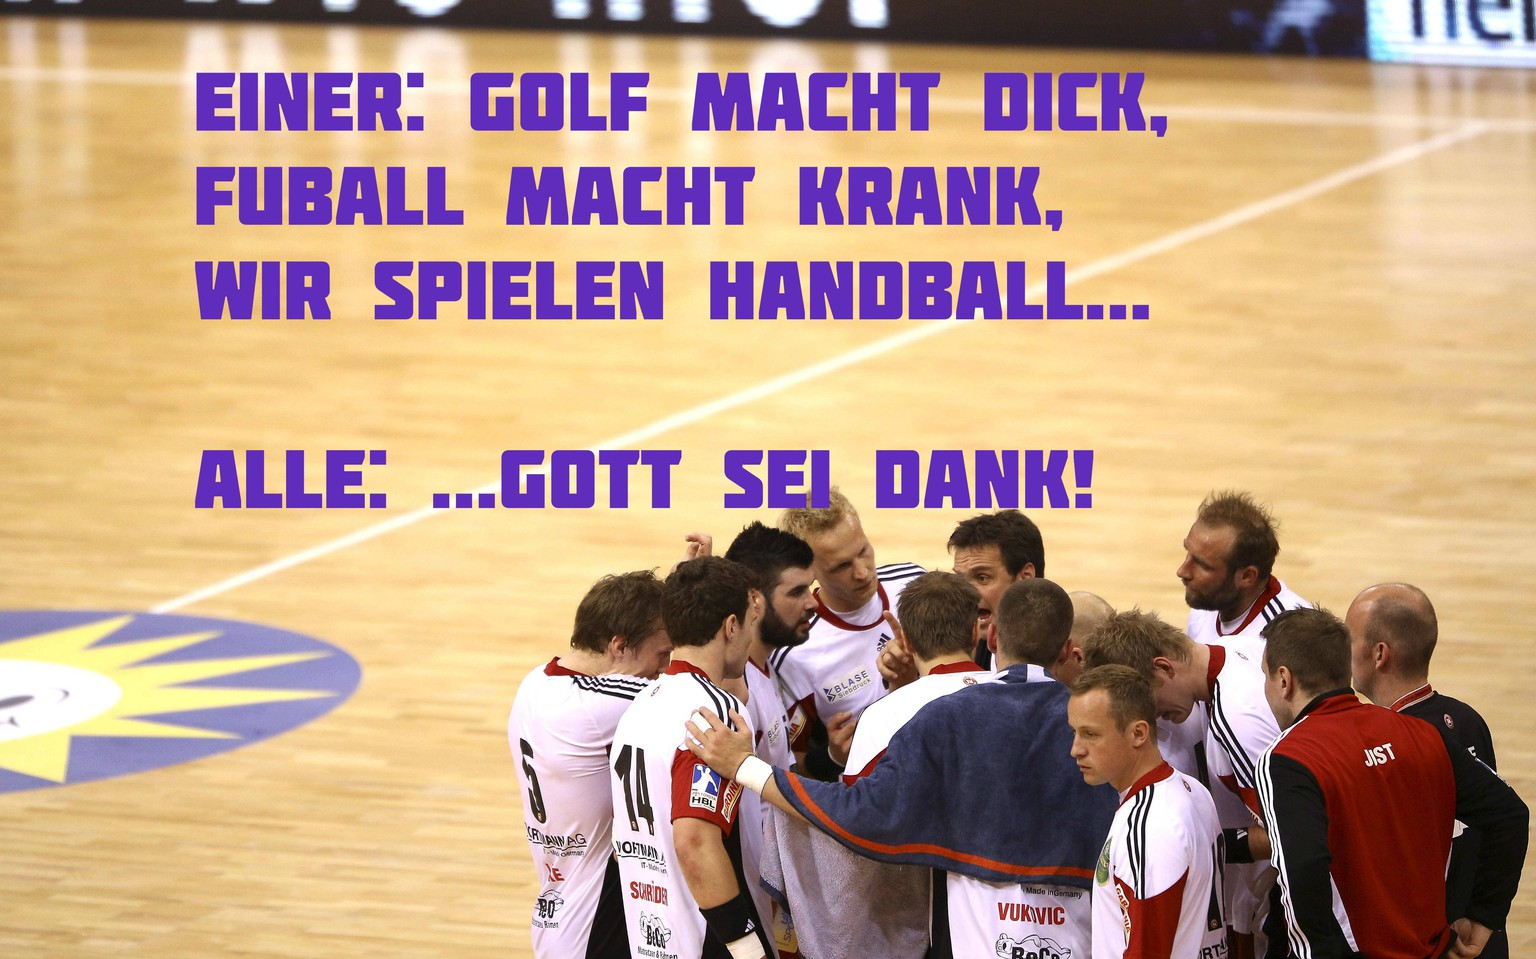 handballecke